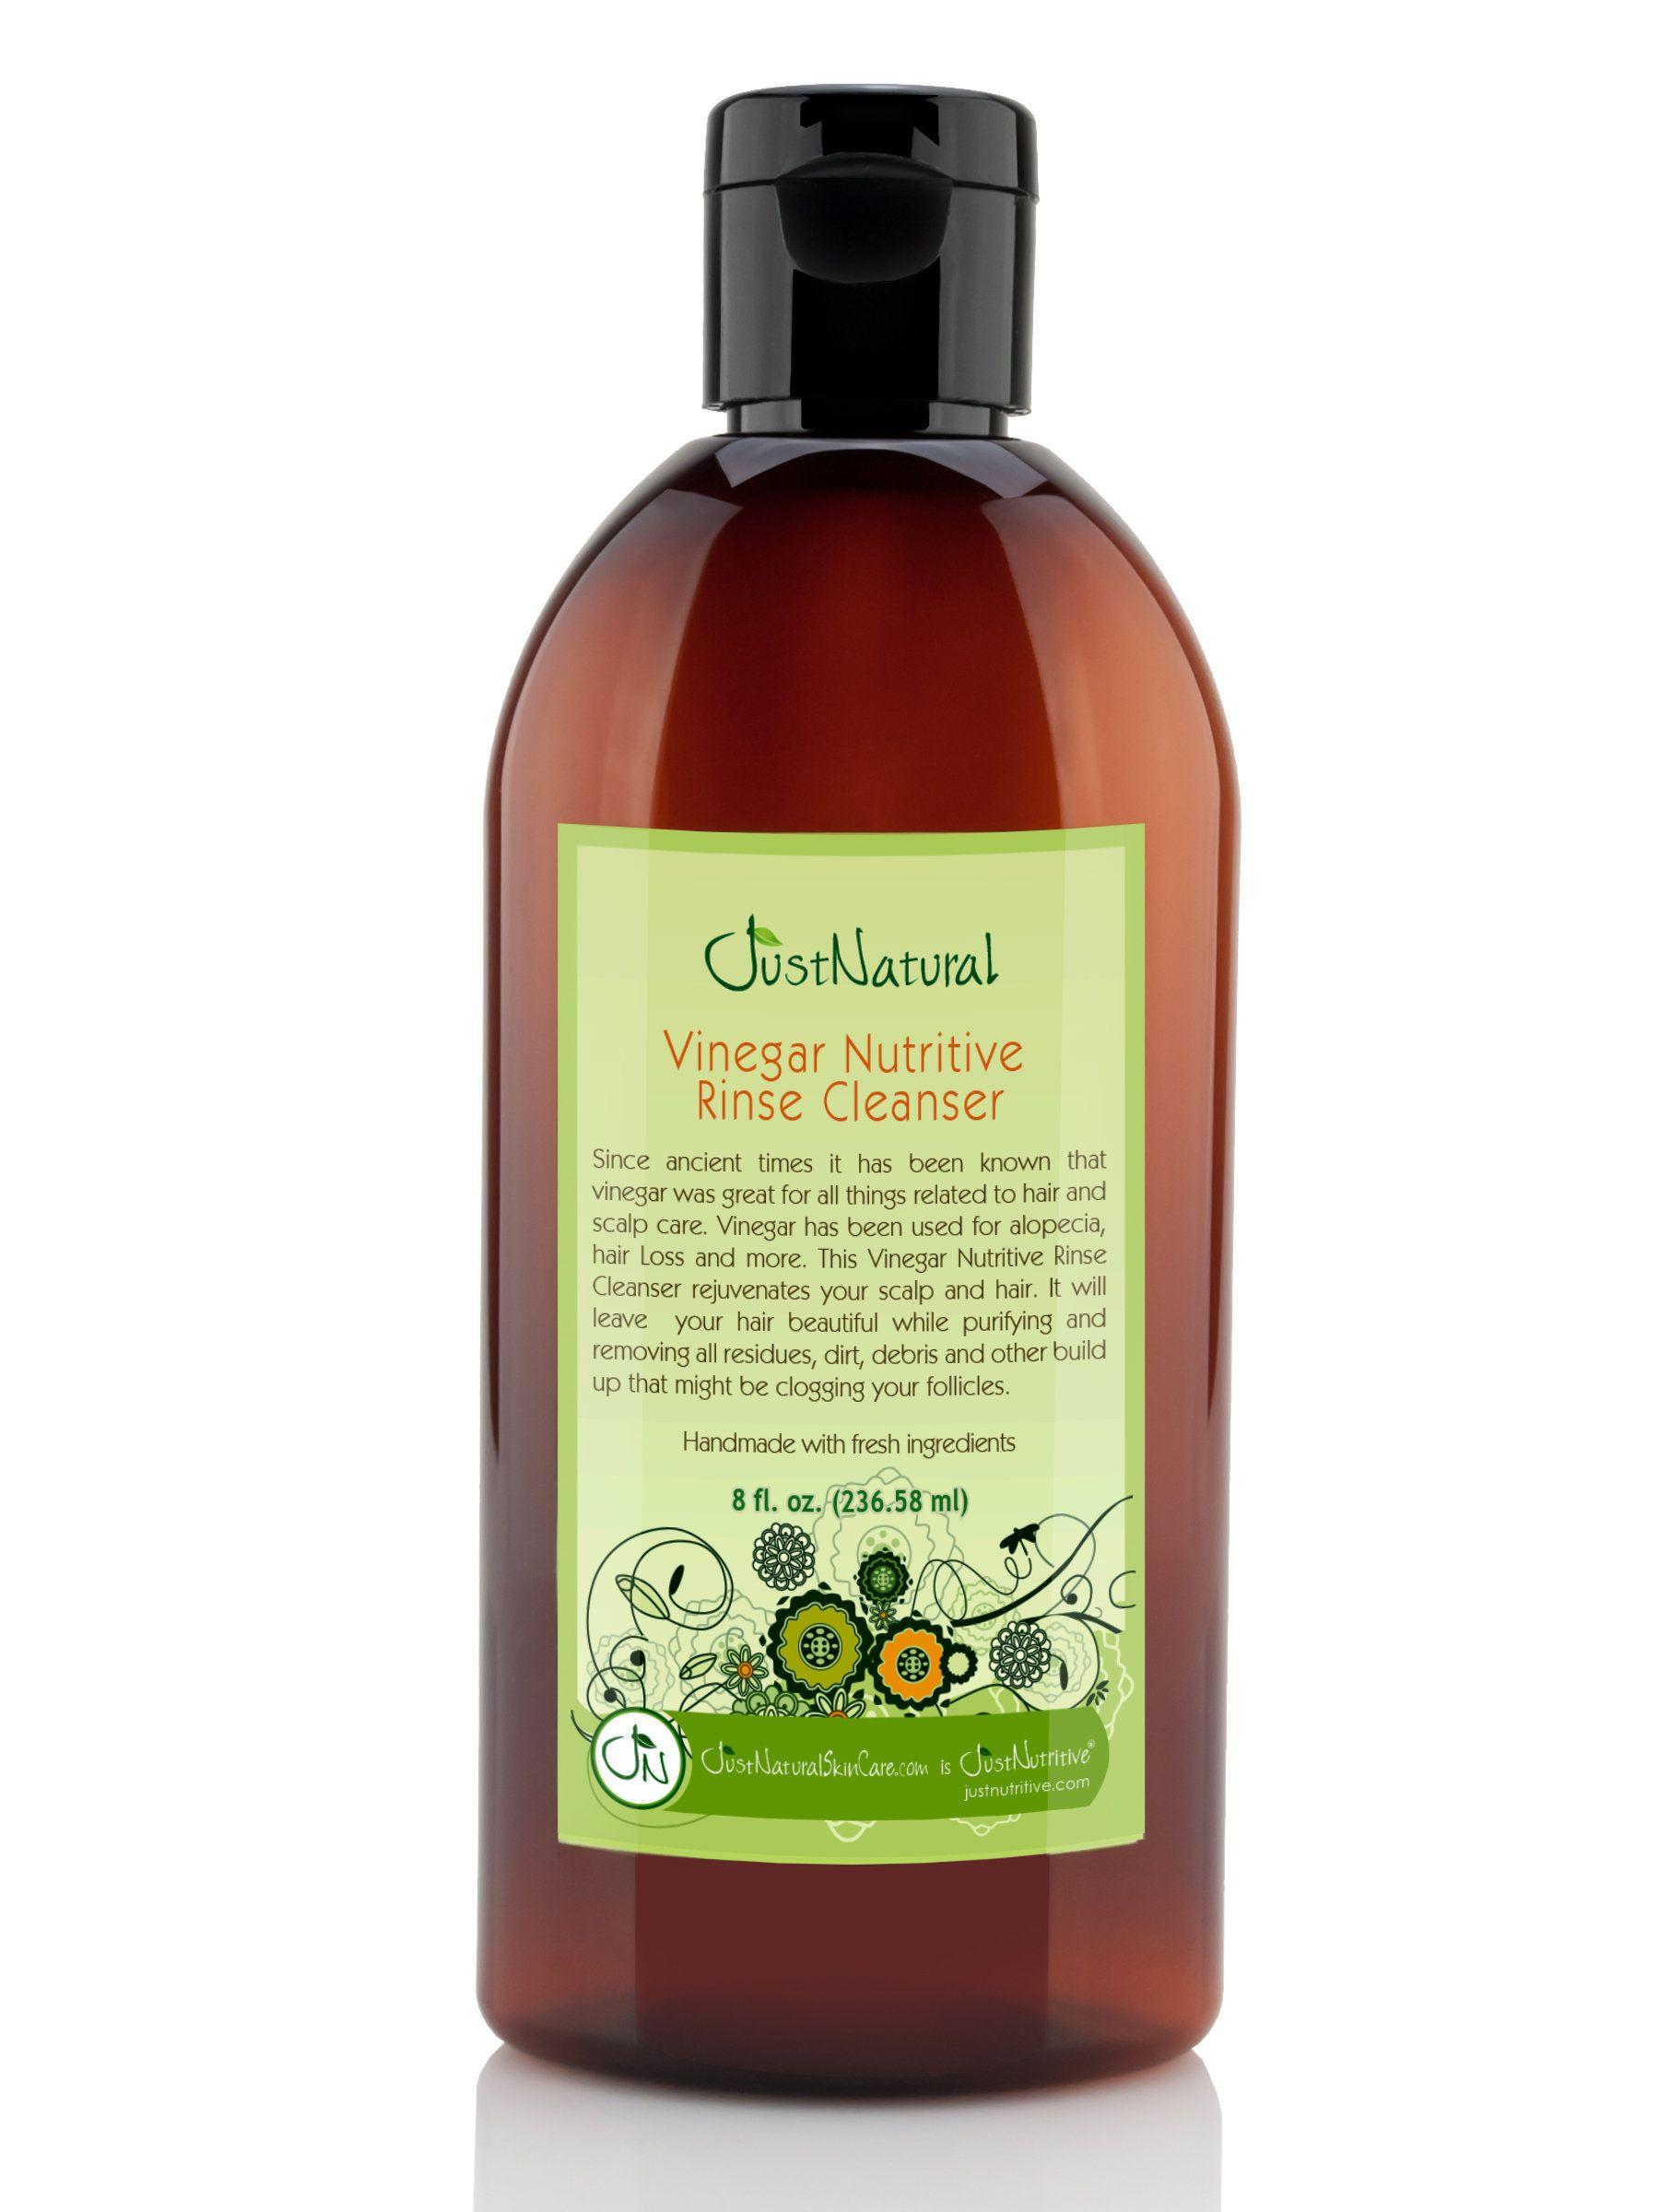 Vinegar Nutritive Rinse Cleanser Vinegar nutritive rinse